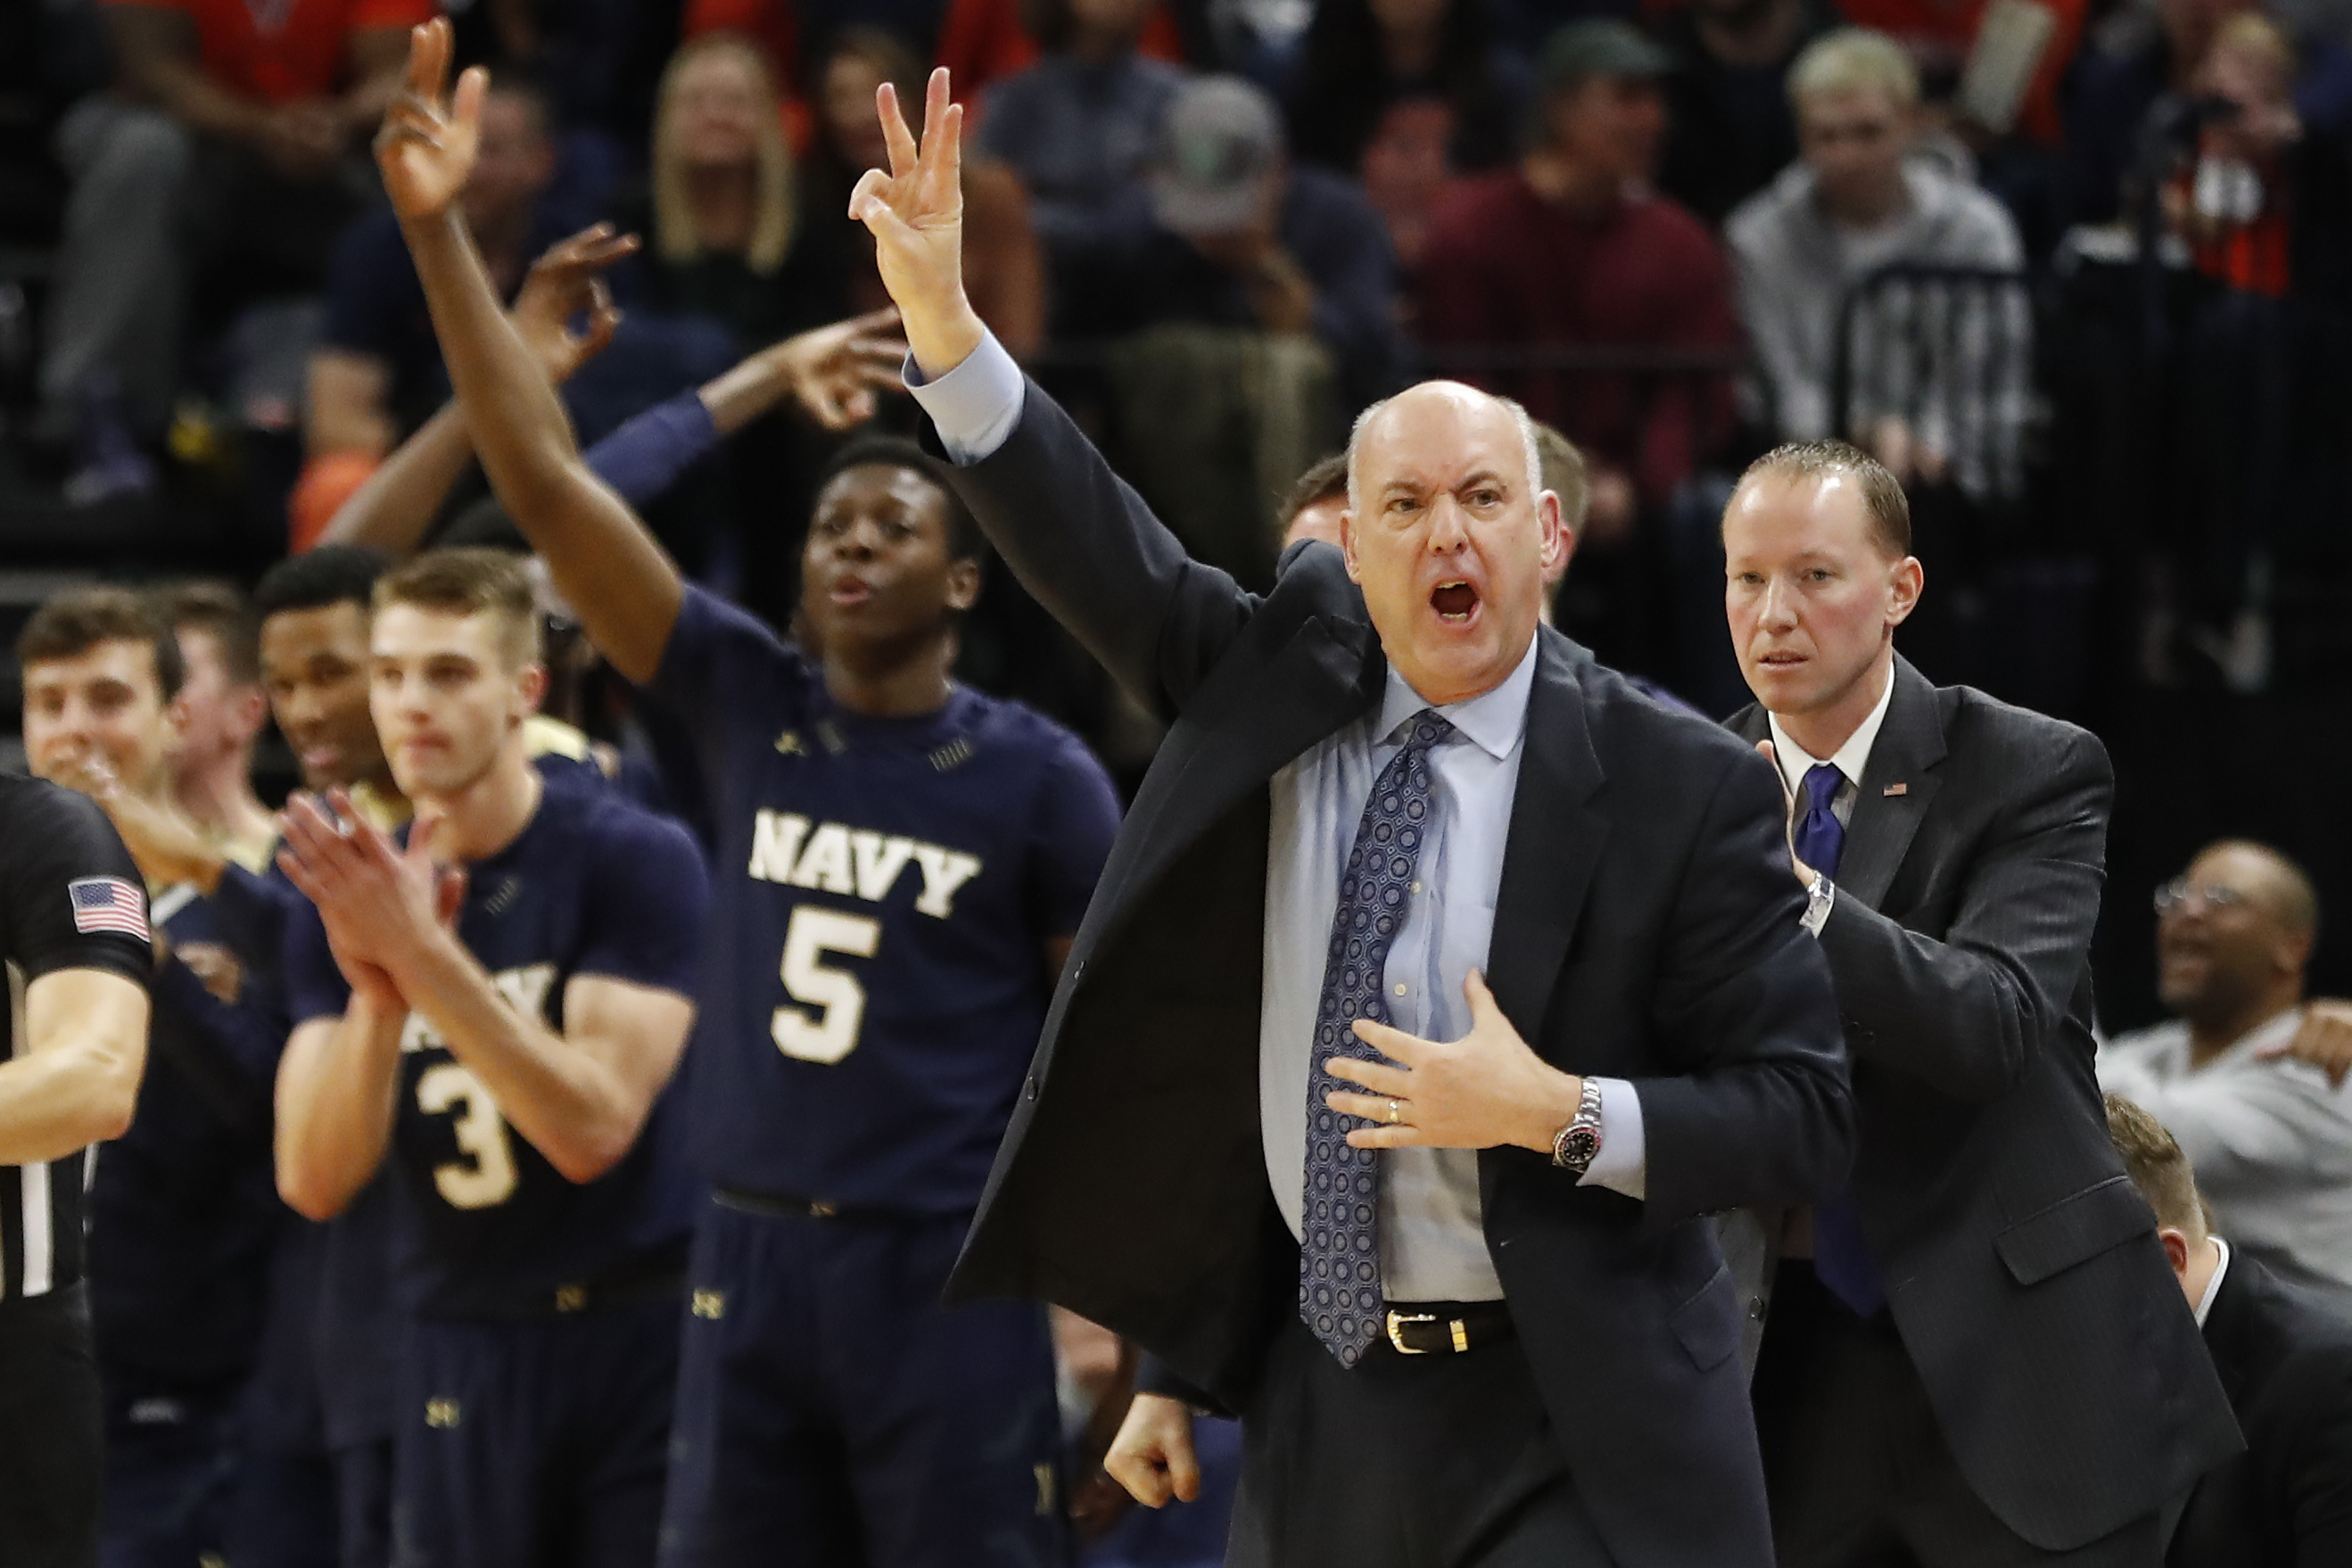 Navy Midshipmen head coach Ed DeChellis gestures from the bench against the Virginia Cavaliers in the second half at John Paul Jones Arena.